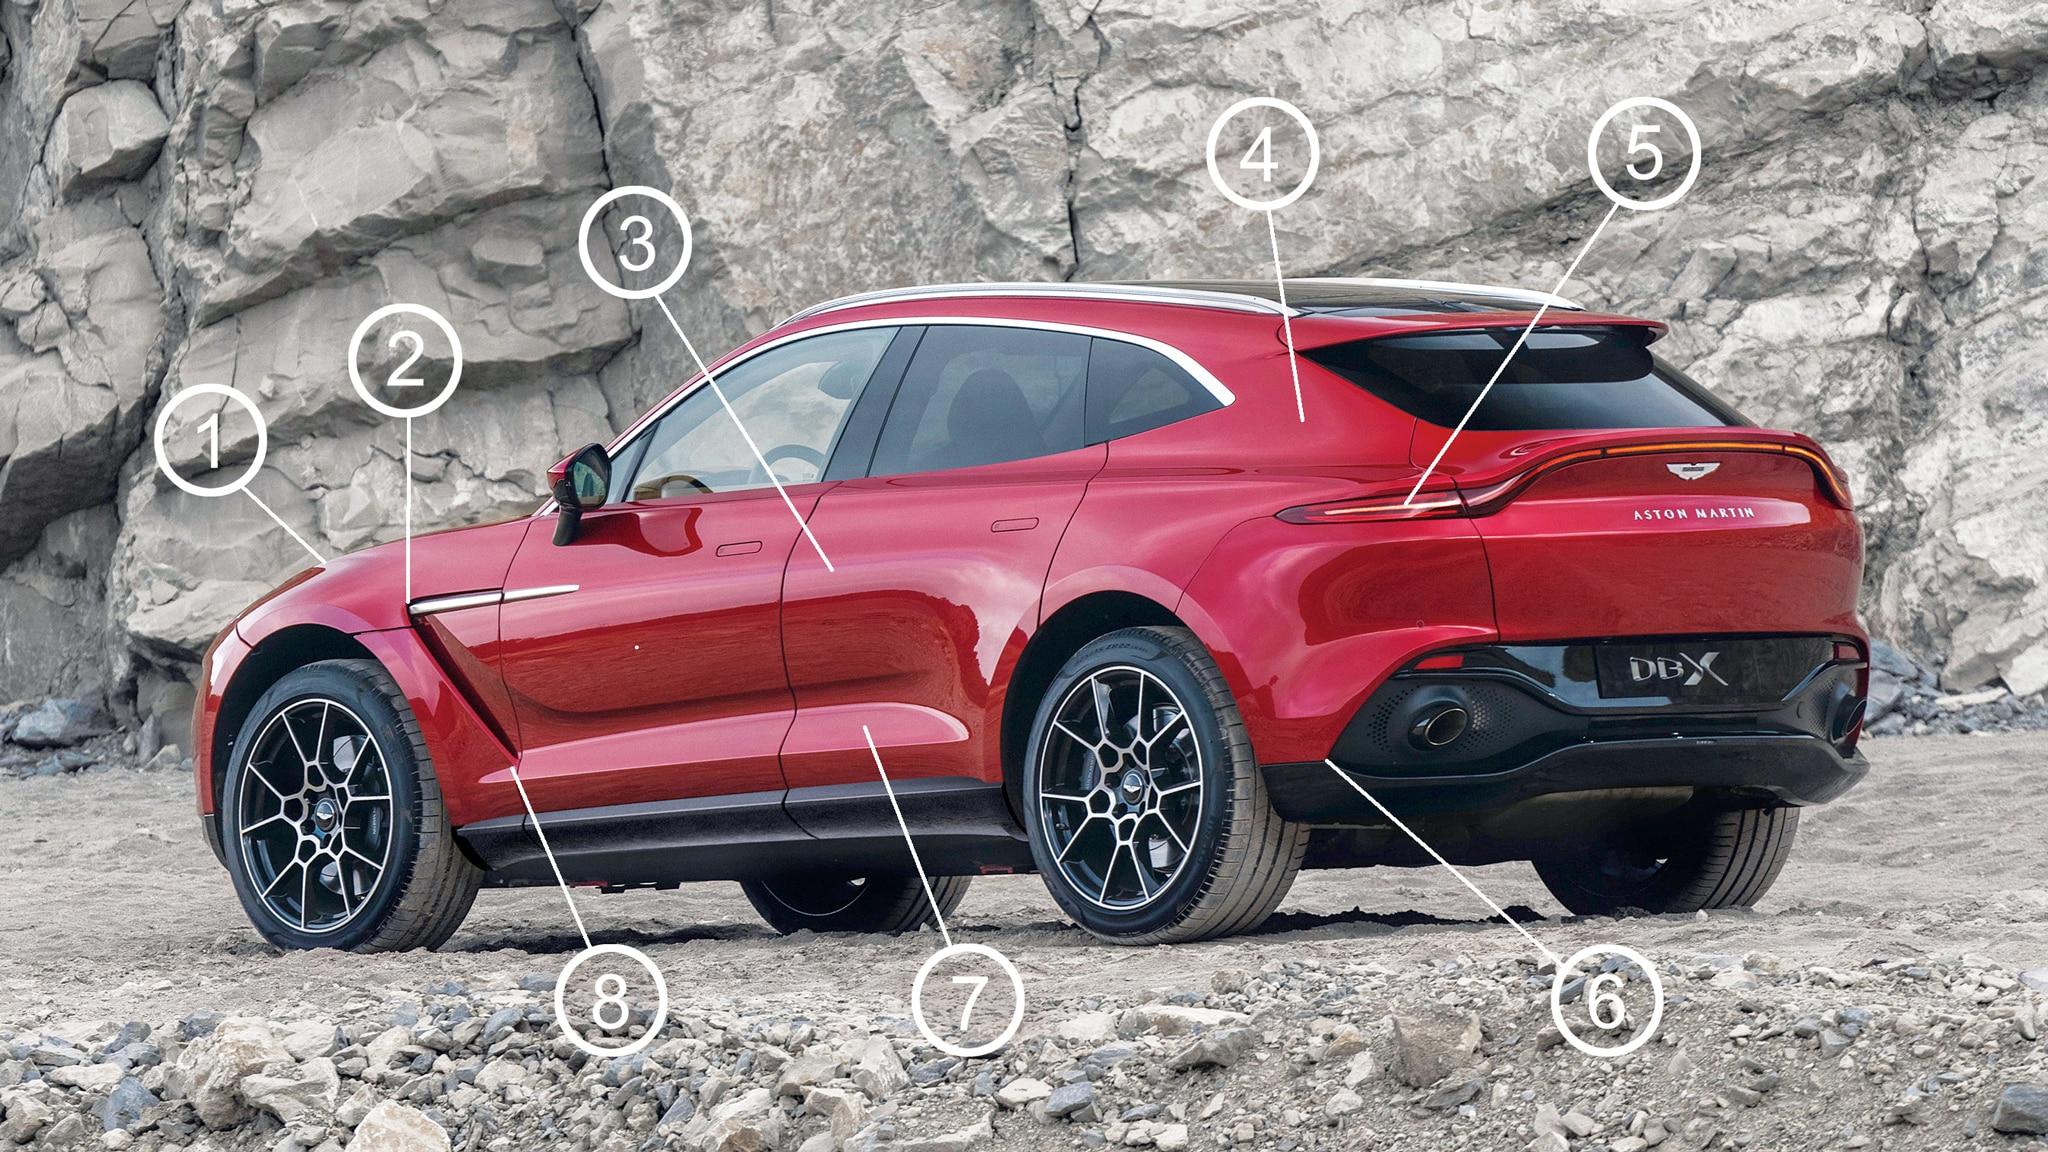 Aston Martin Dbx Design Analysis Is Am S First Suv A Visual Winner